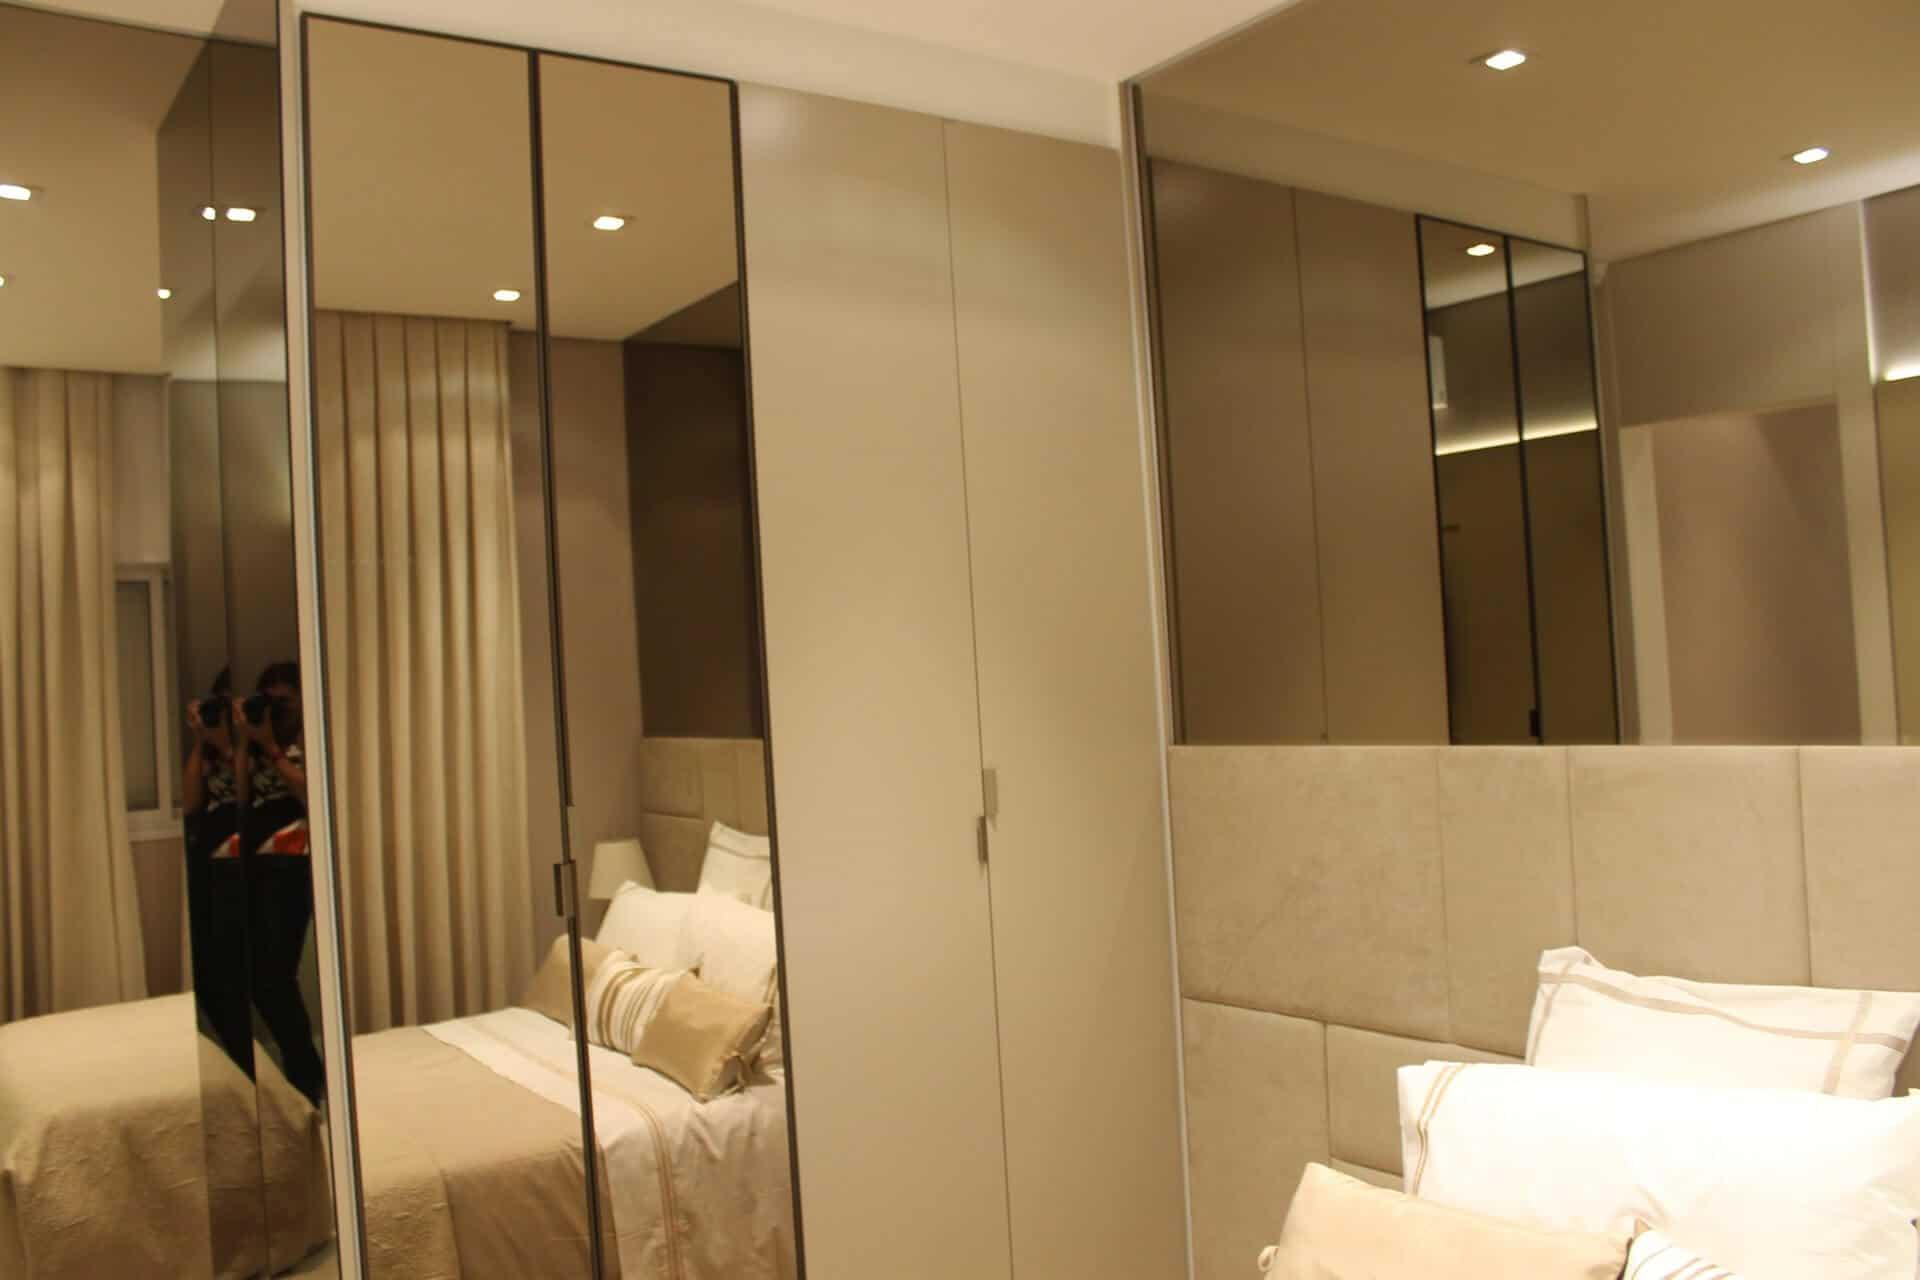 dormitorio-planejado_moveis-sob-medida-galeria-44